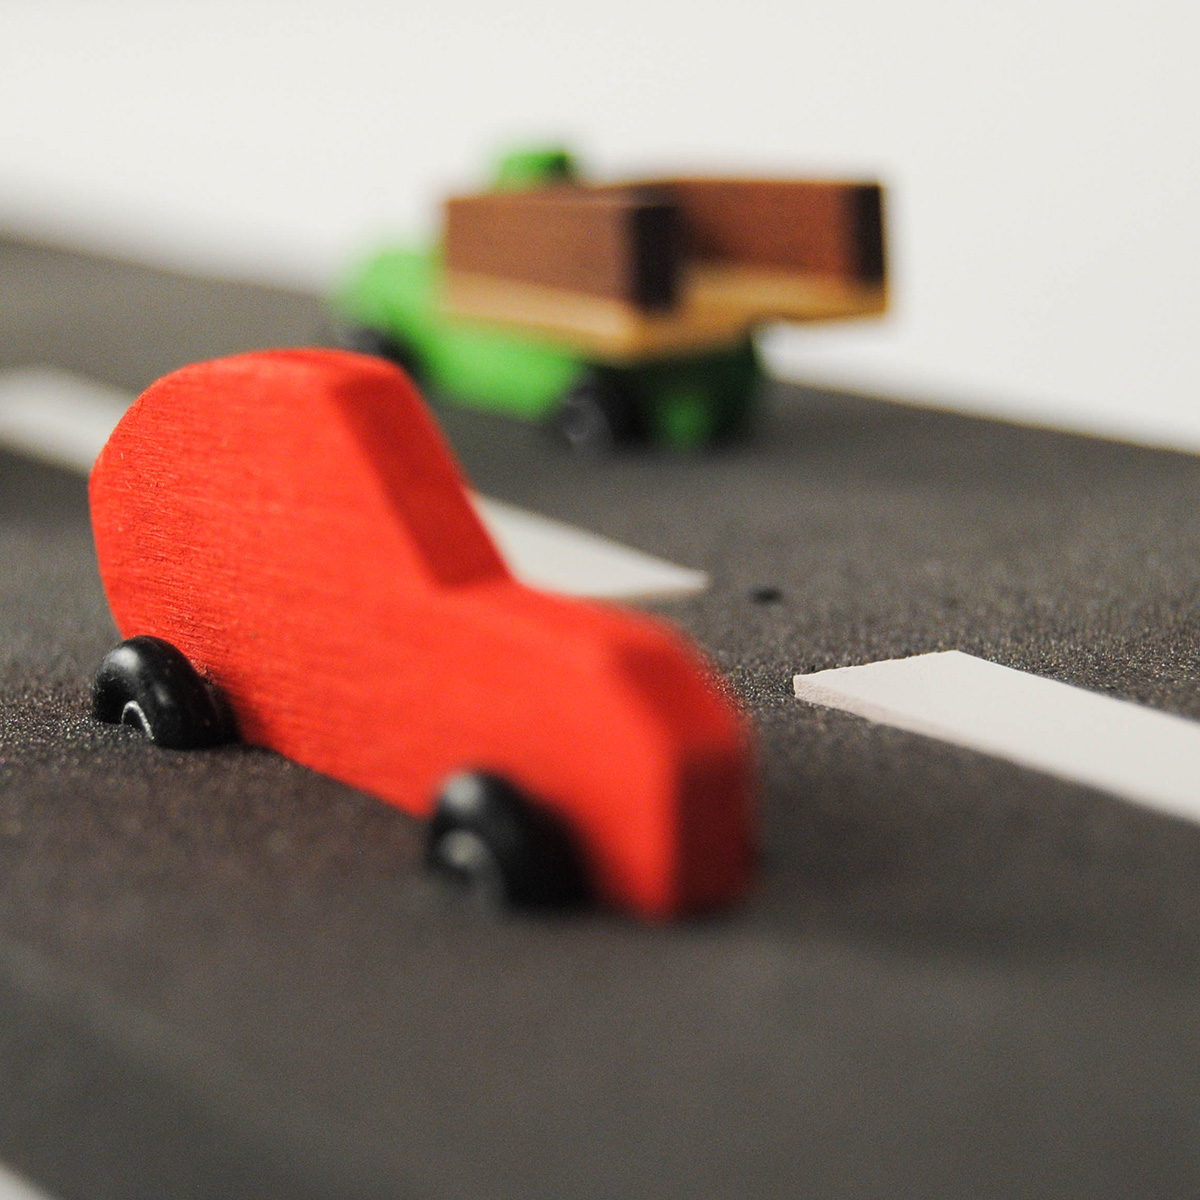 macchinina-legno-toy-wood-design